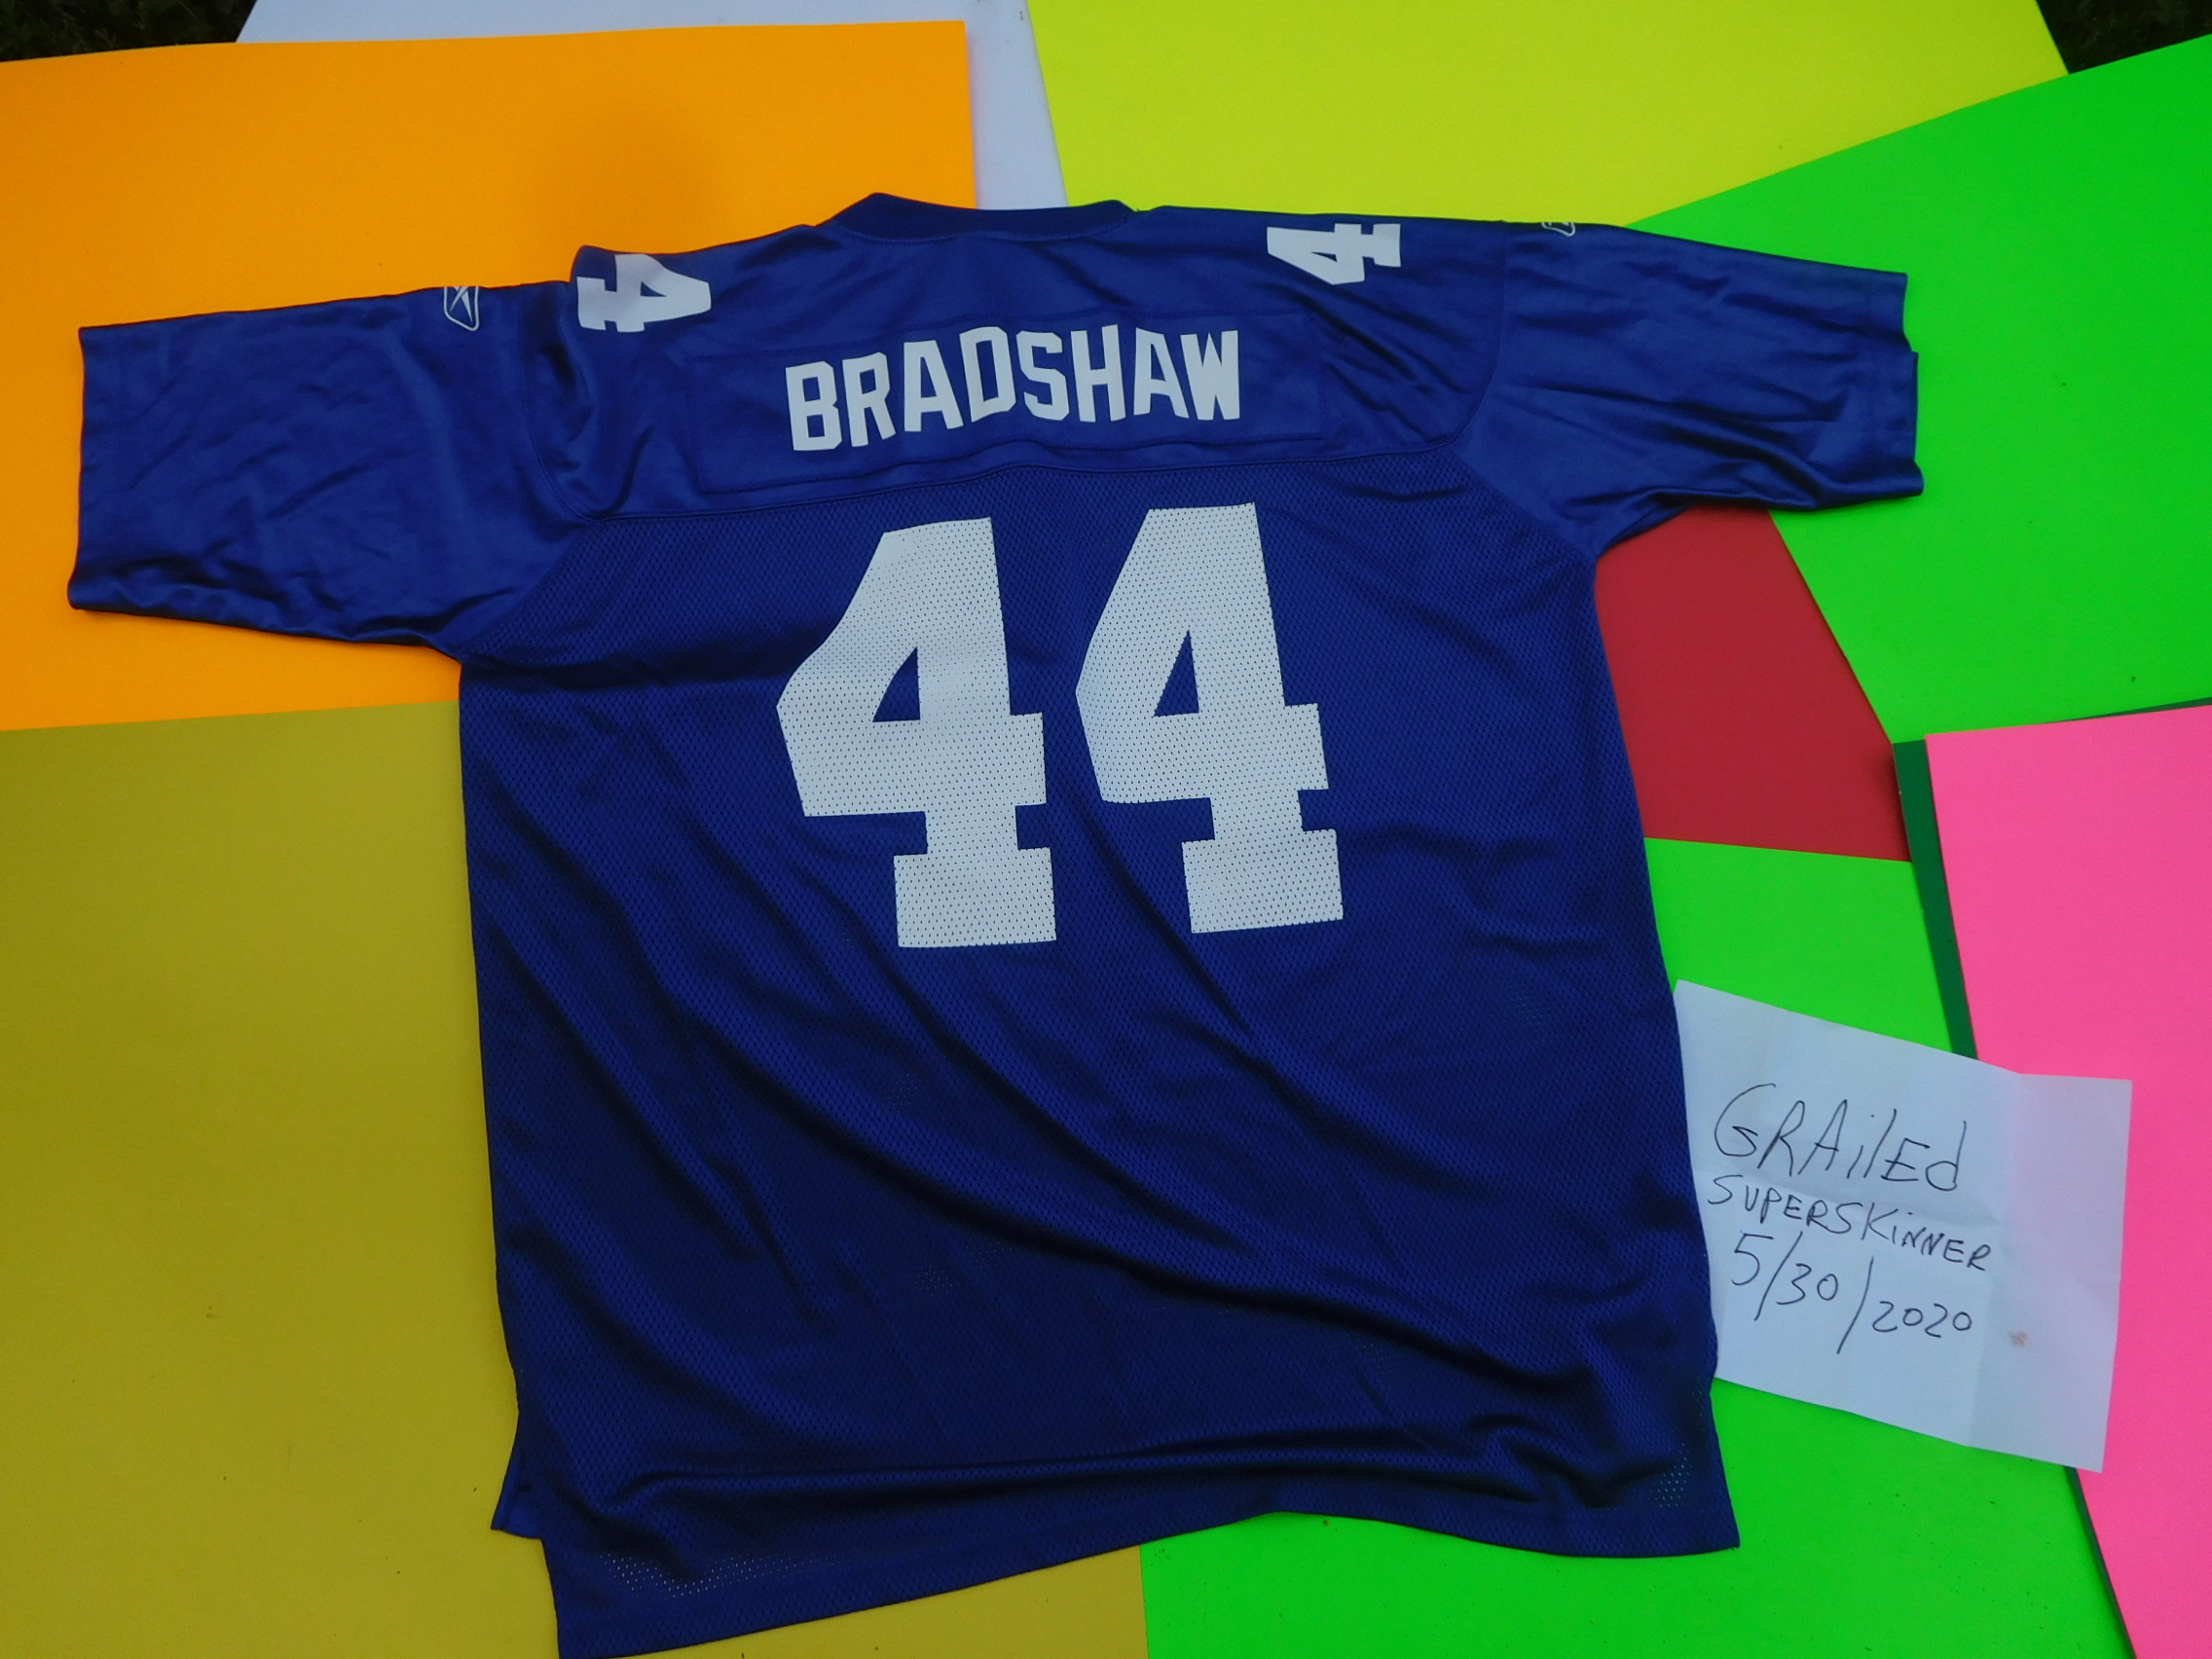 Vintage VINTAGE Ahmad Bradshaw jersey licensed Great buy